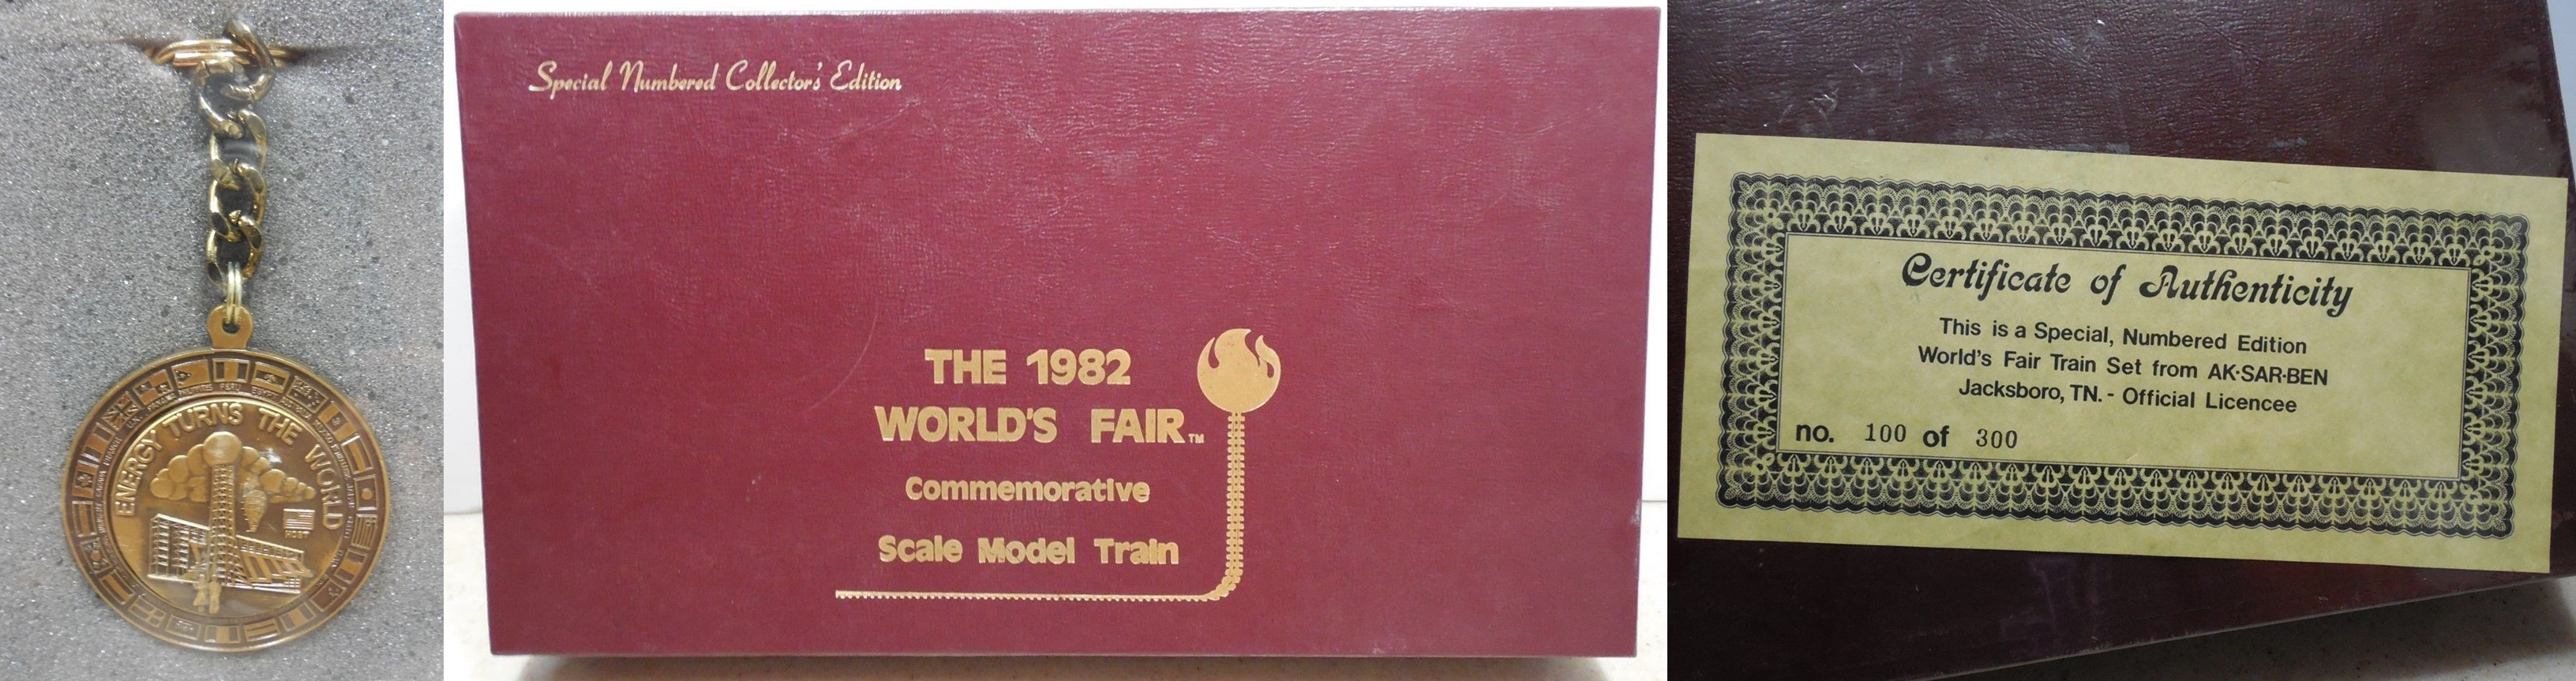 N Scale - Ak-Sar-Ben - The 1982 World